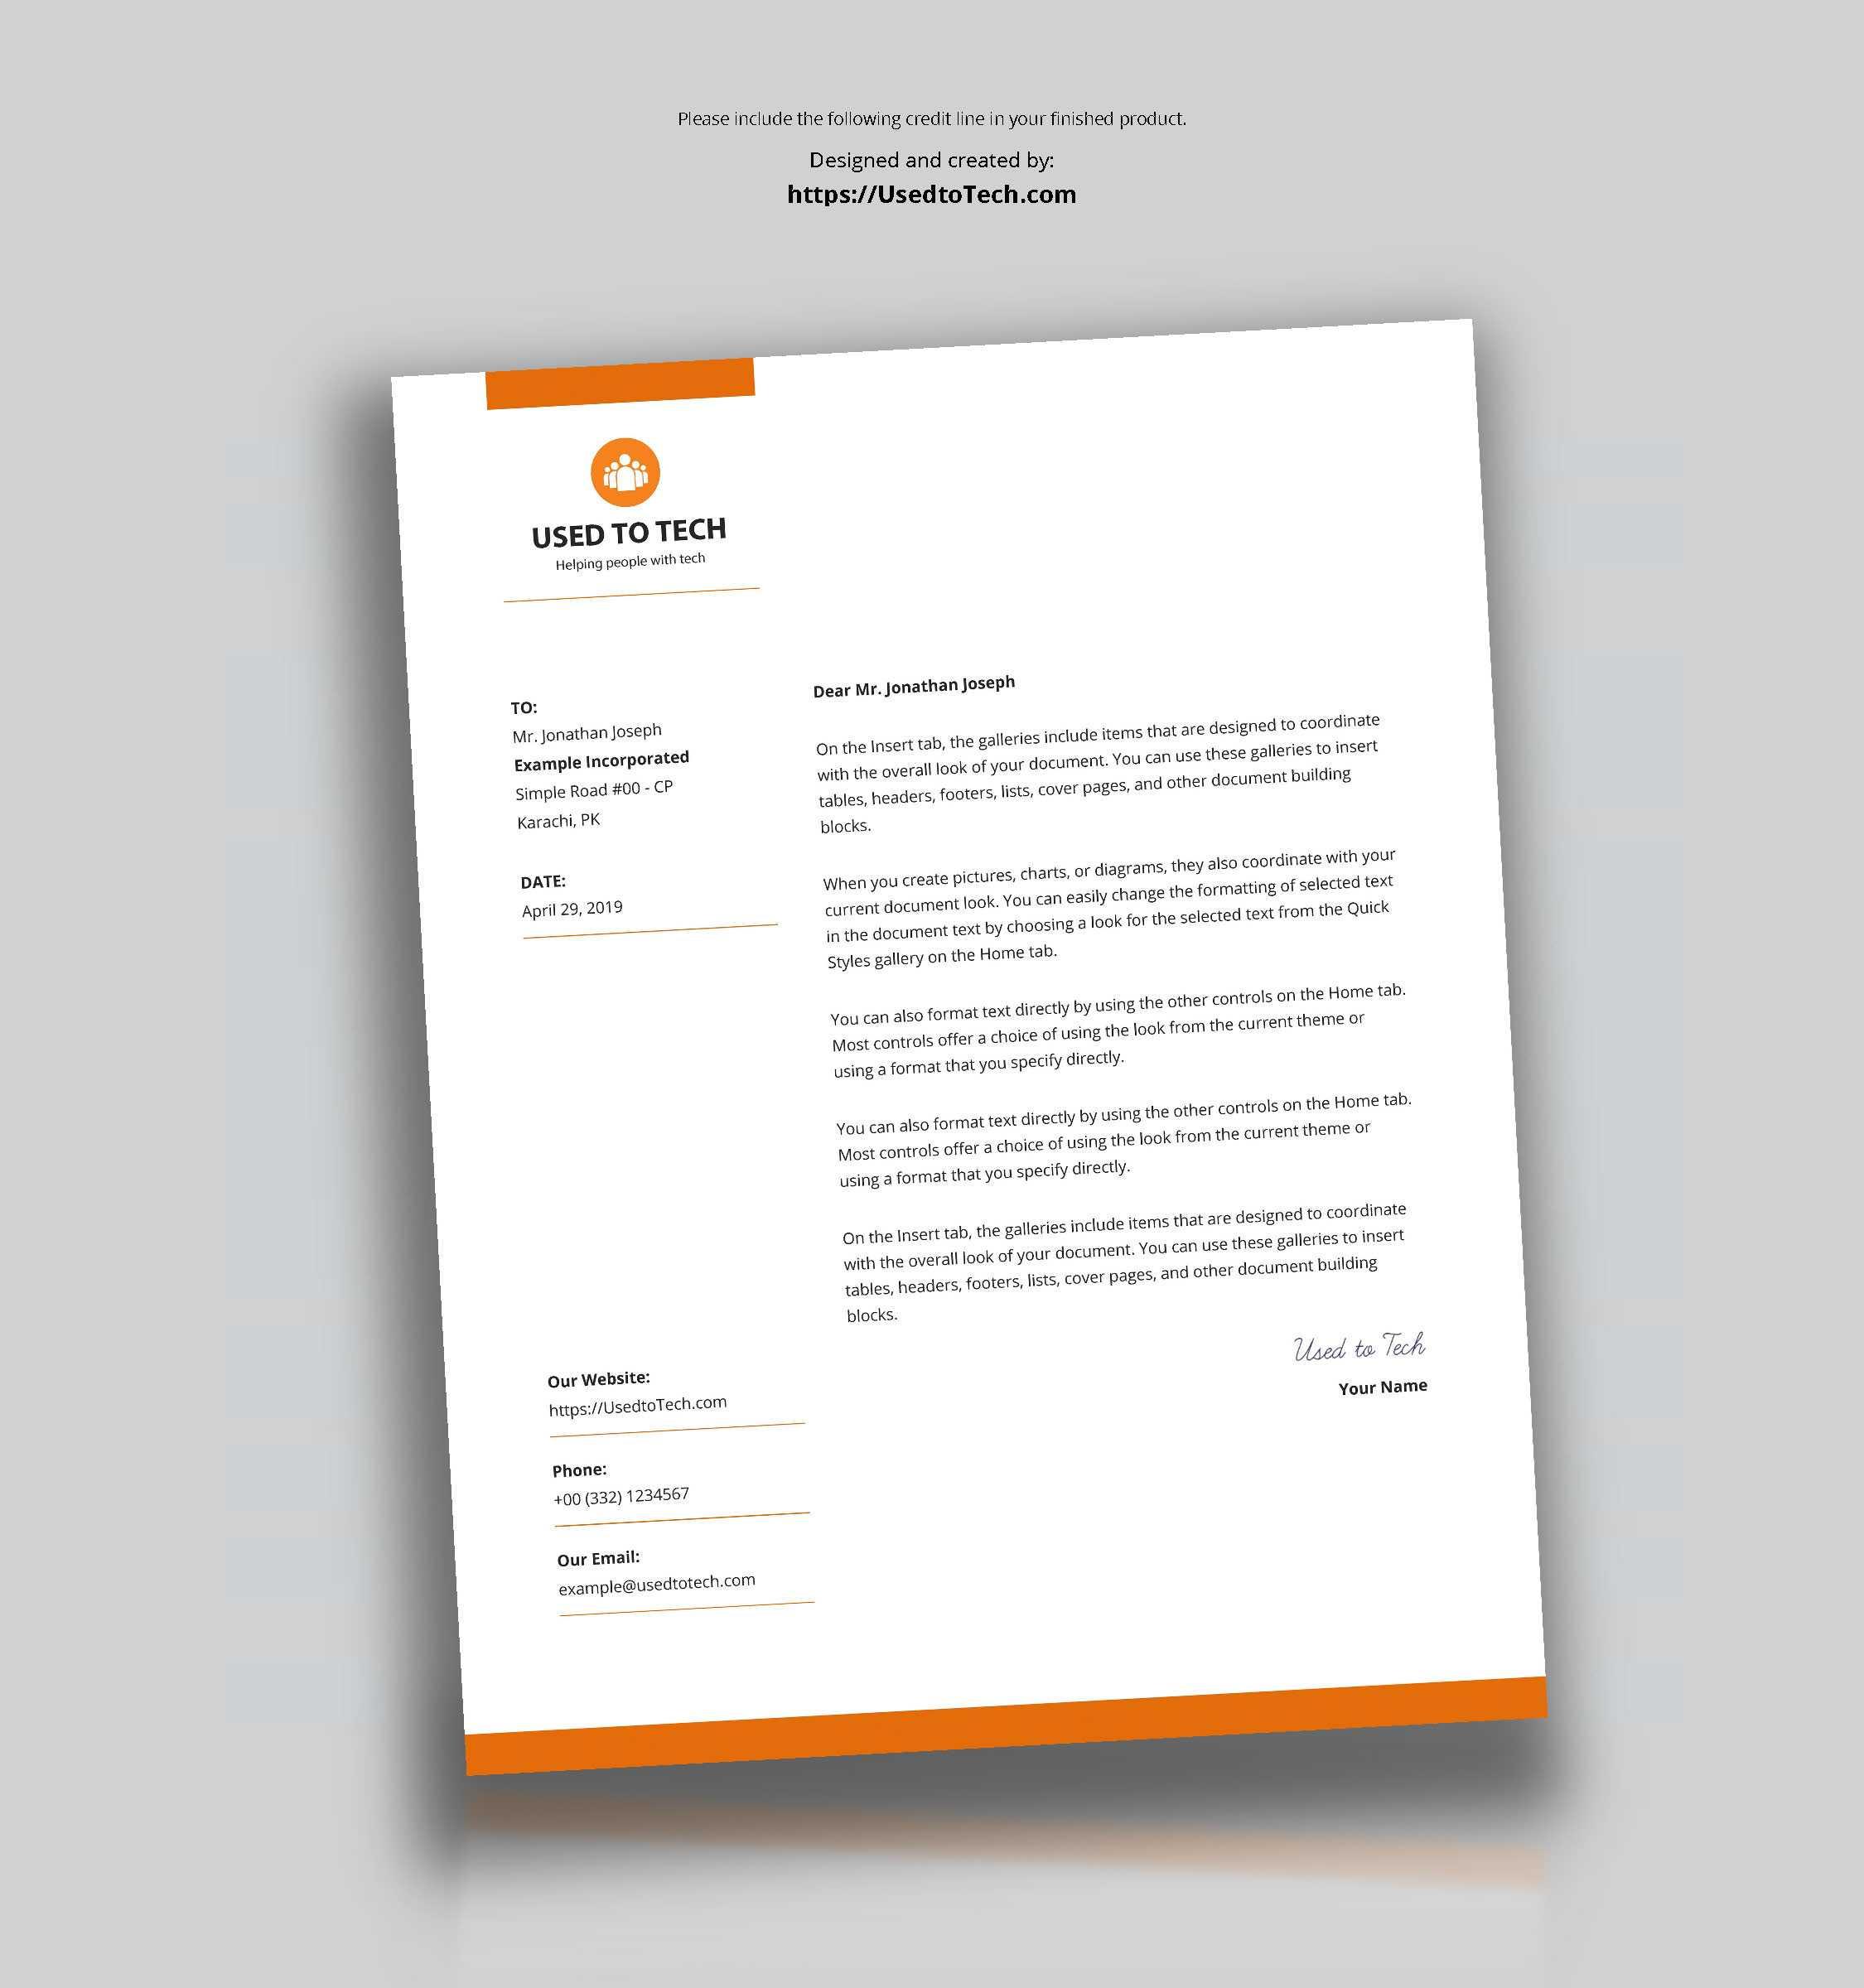 Modern Letterhead Template In Microsoft Word Free - Used To Tech Regarding Free Letterhead Templates For Microsoft Word